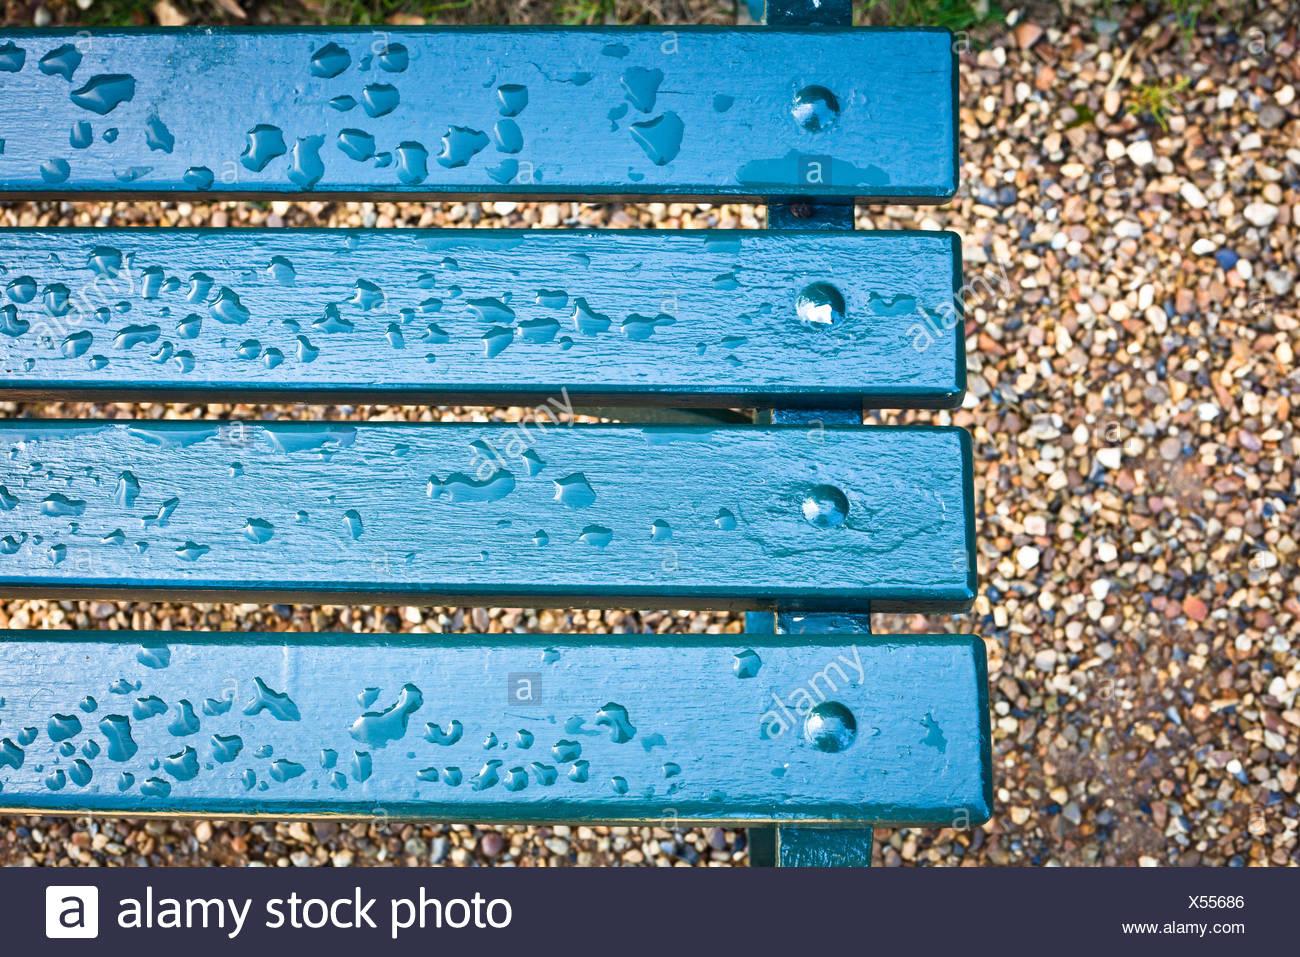 Rain drops on a blue park bench - Stock Image